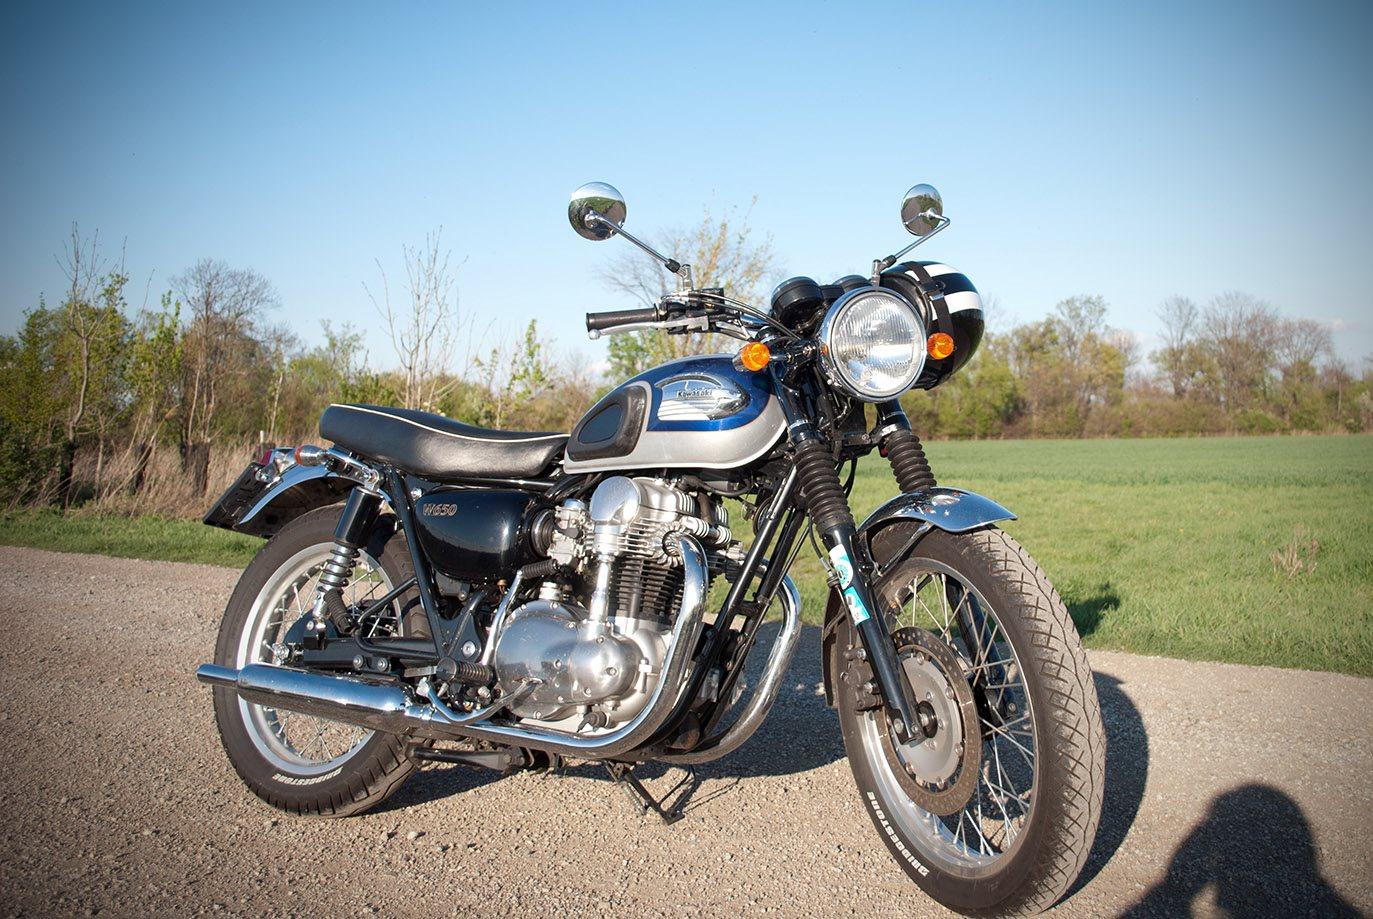 Umgebautes Motorrad Kawasaki W 650 Von Modderfreak 1000psat